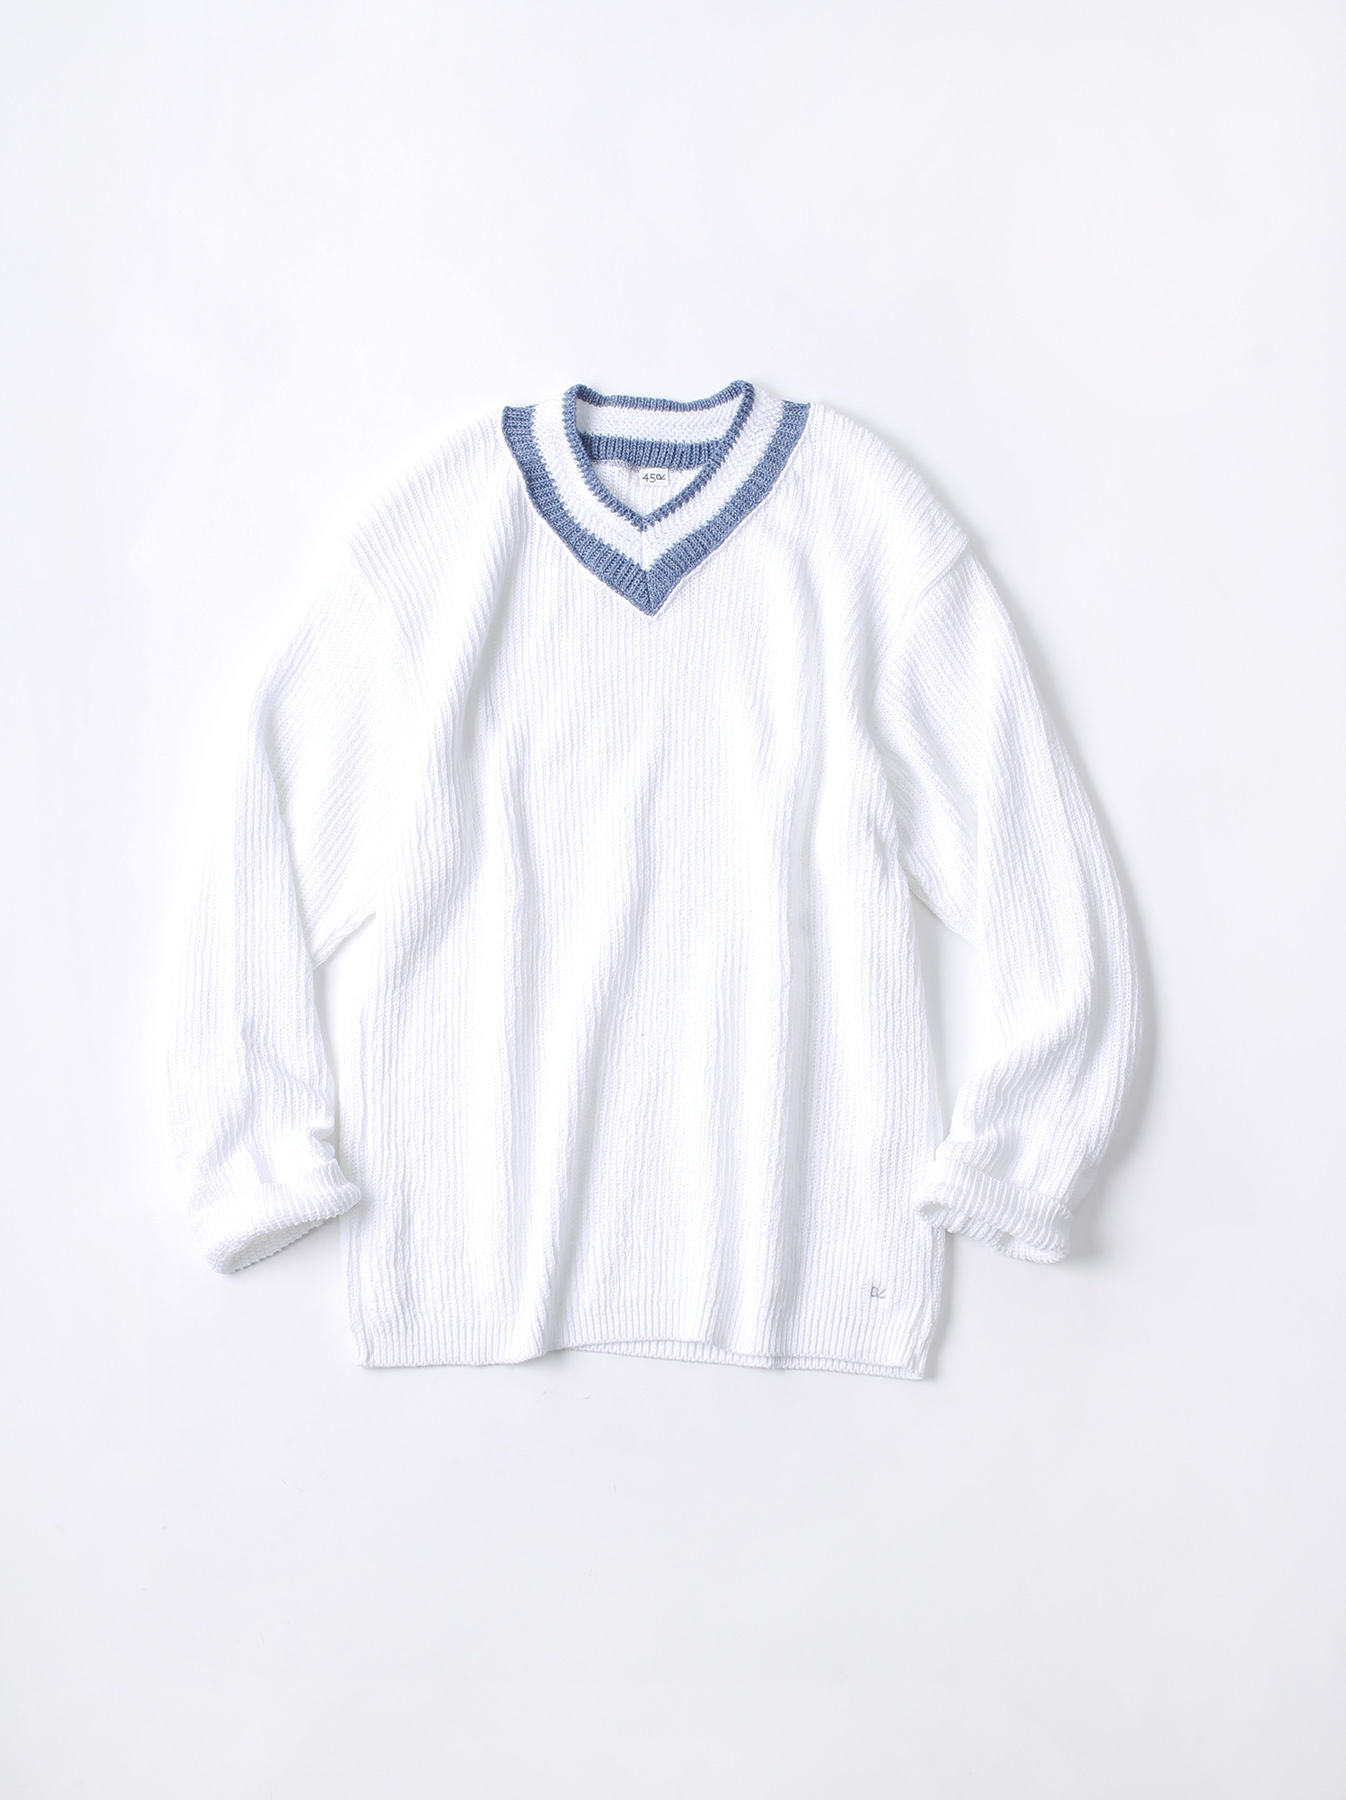 WH Zimbabwe Cotton Cable Knit Sweater-1